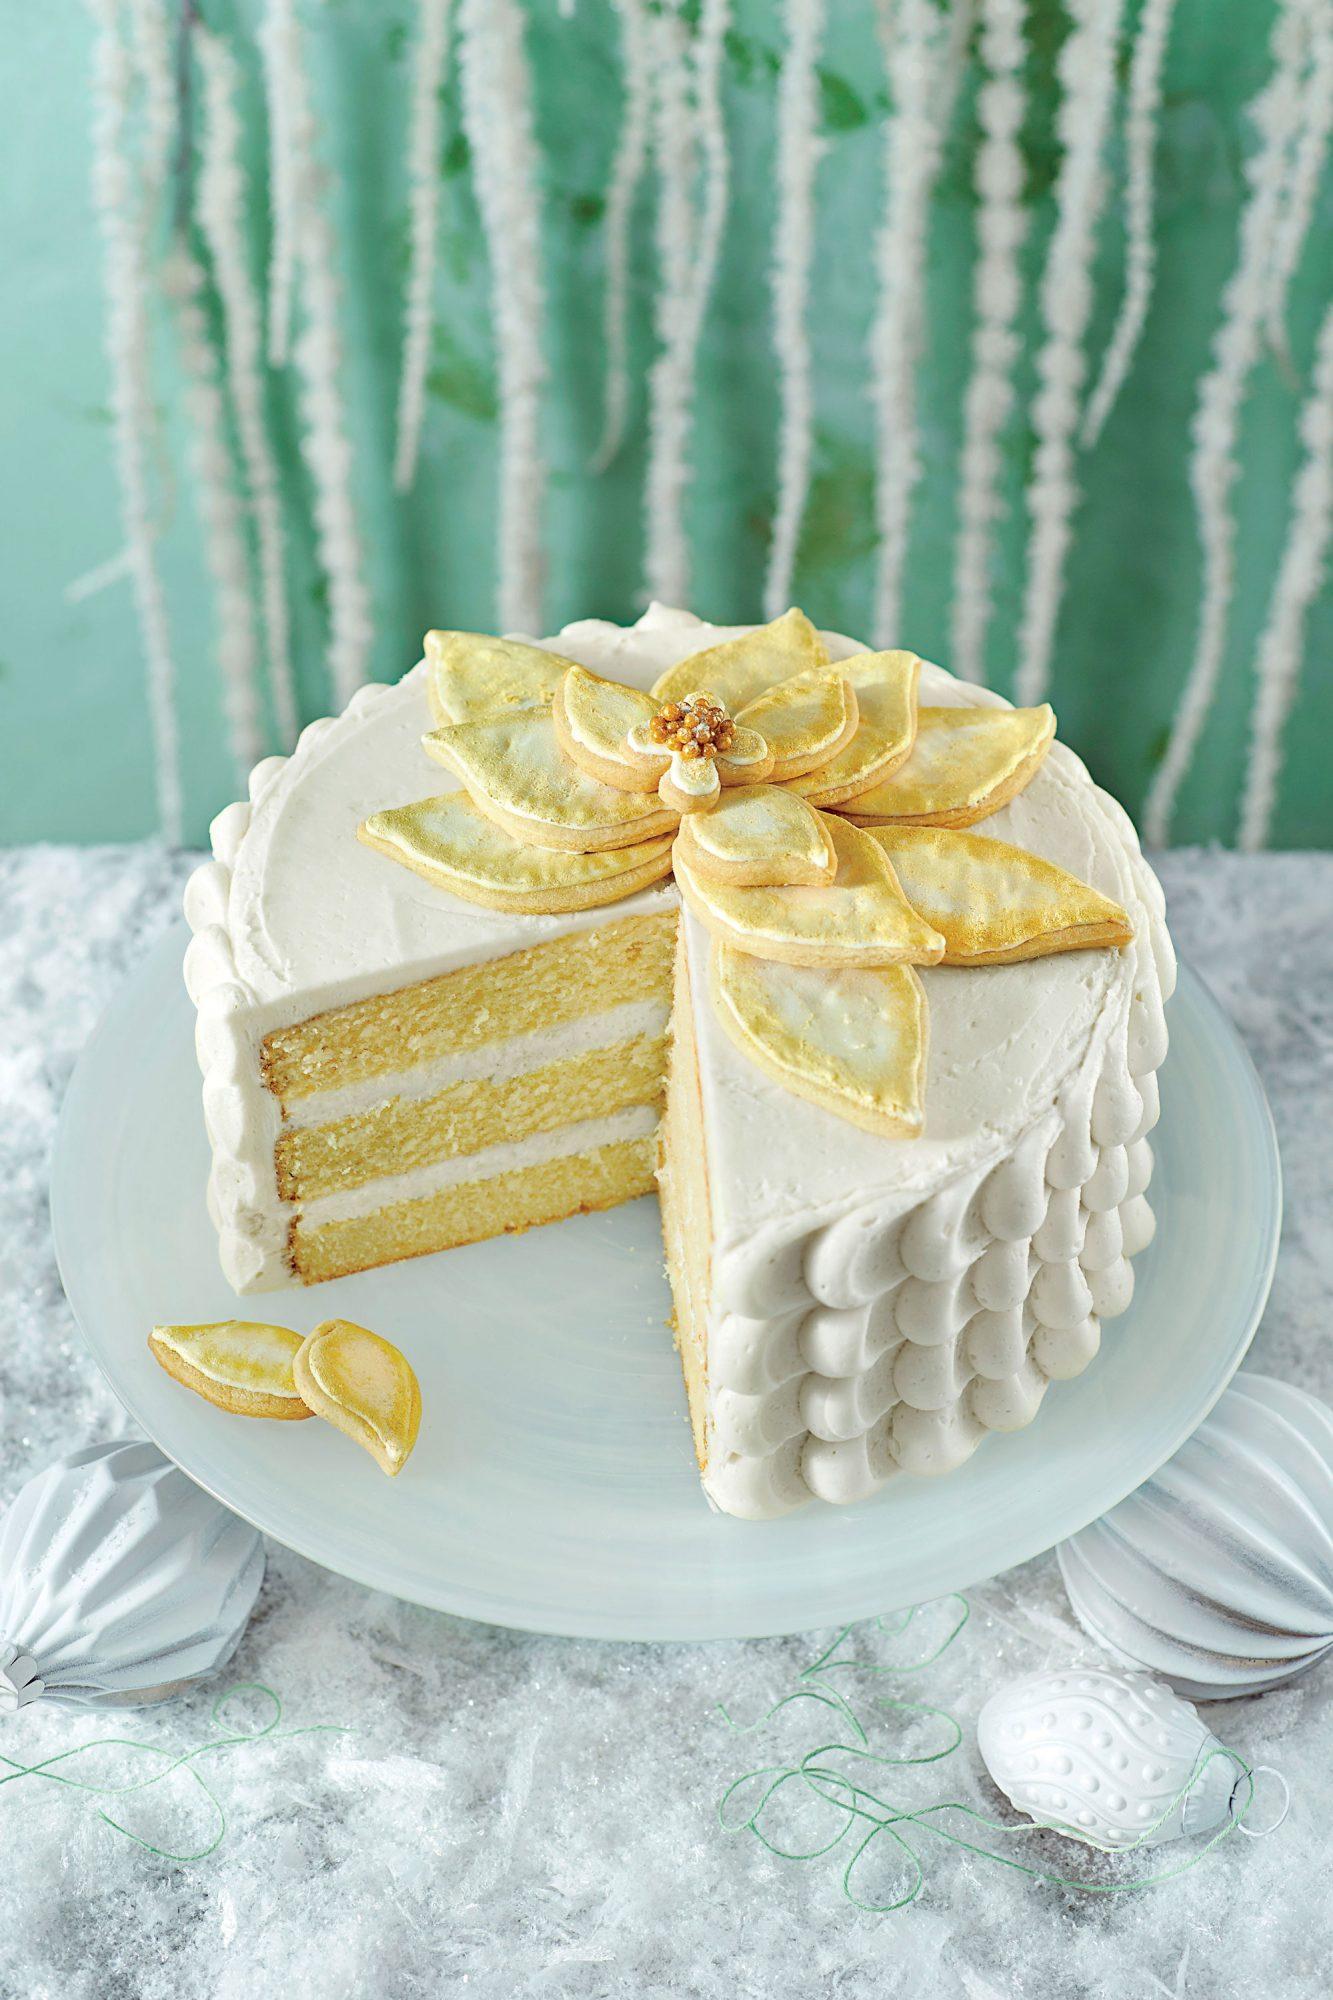 White Chocolate Poinsettia Cake image